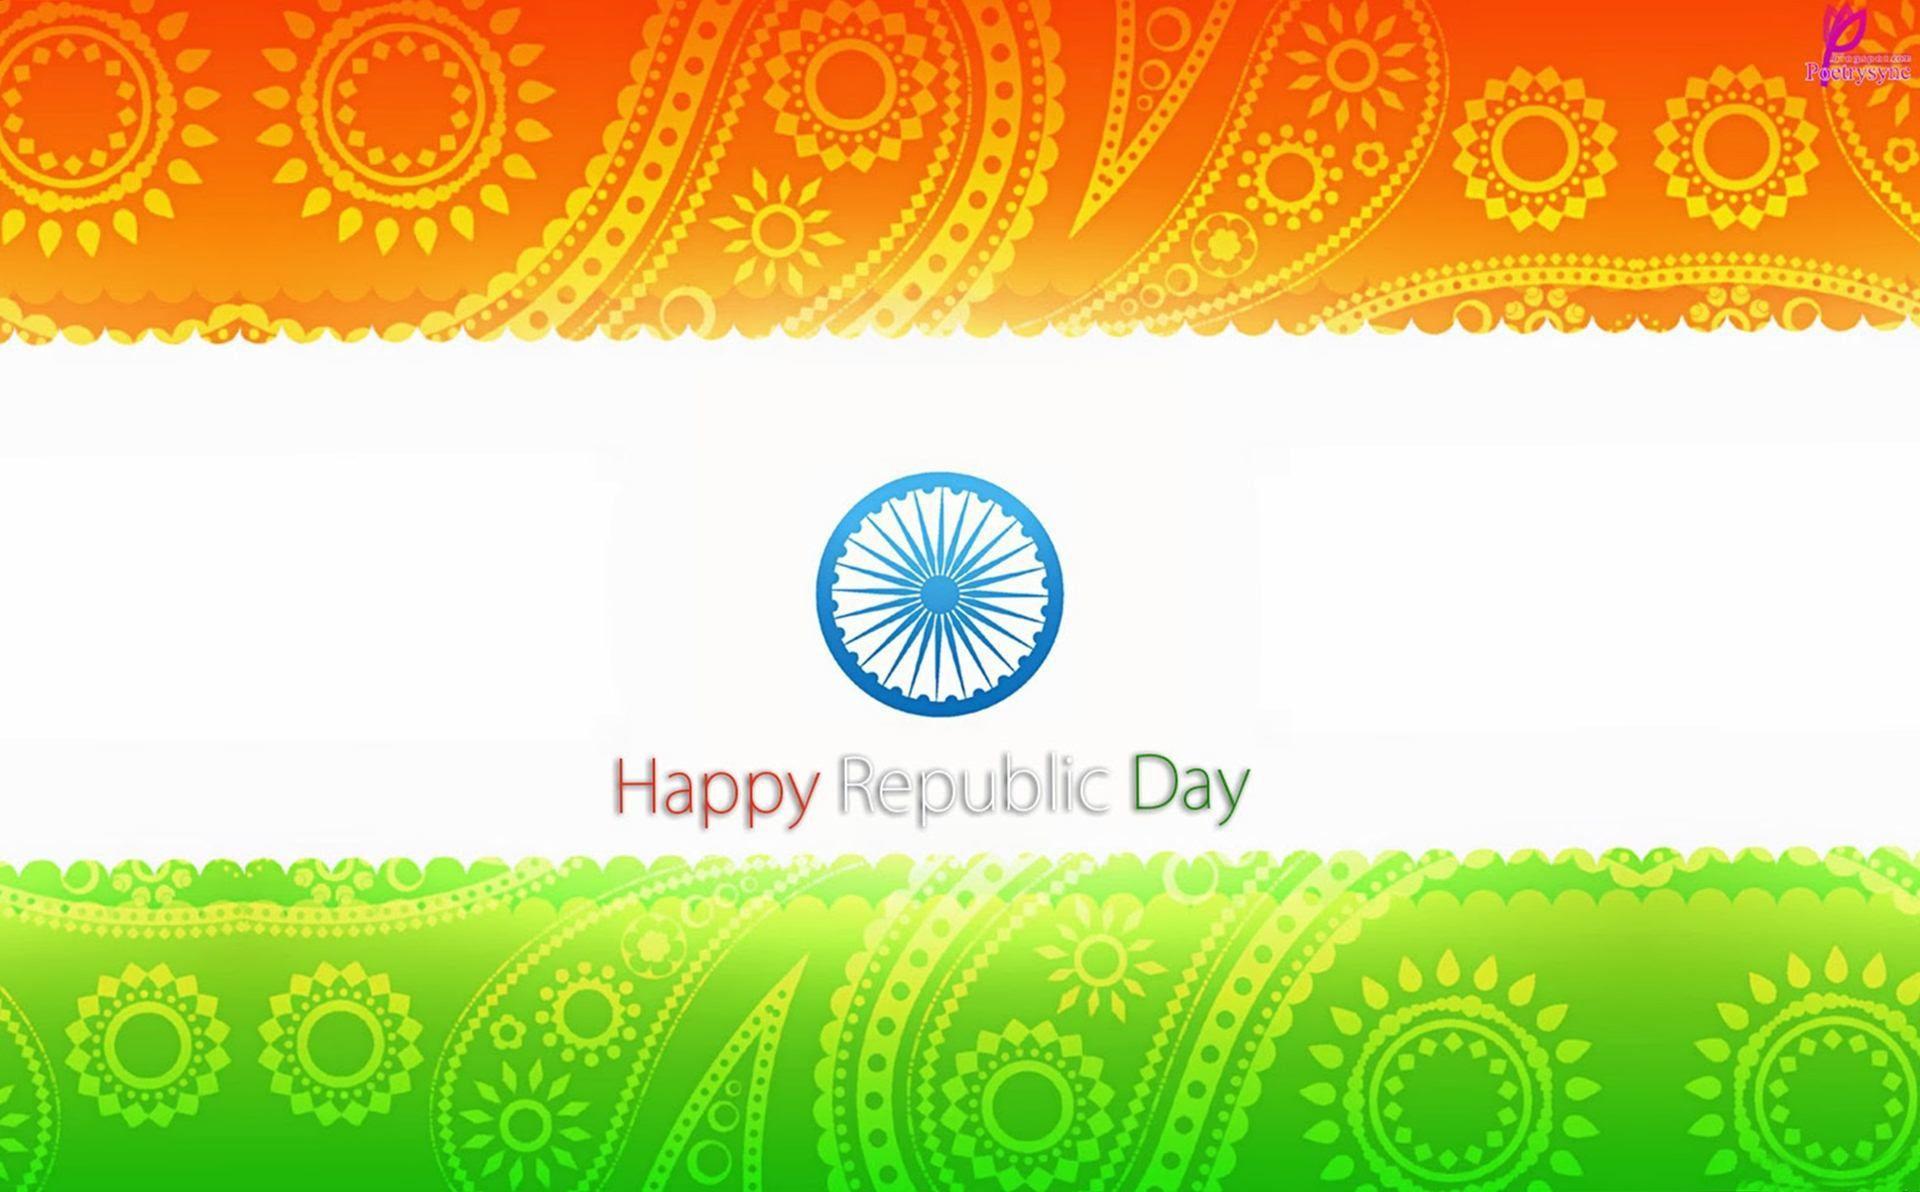 Republic Day 2020 Hd Wallpaper For WhatsApp